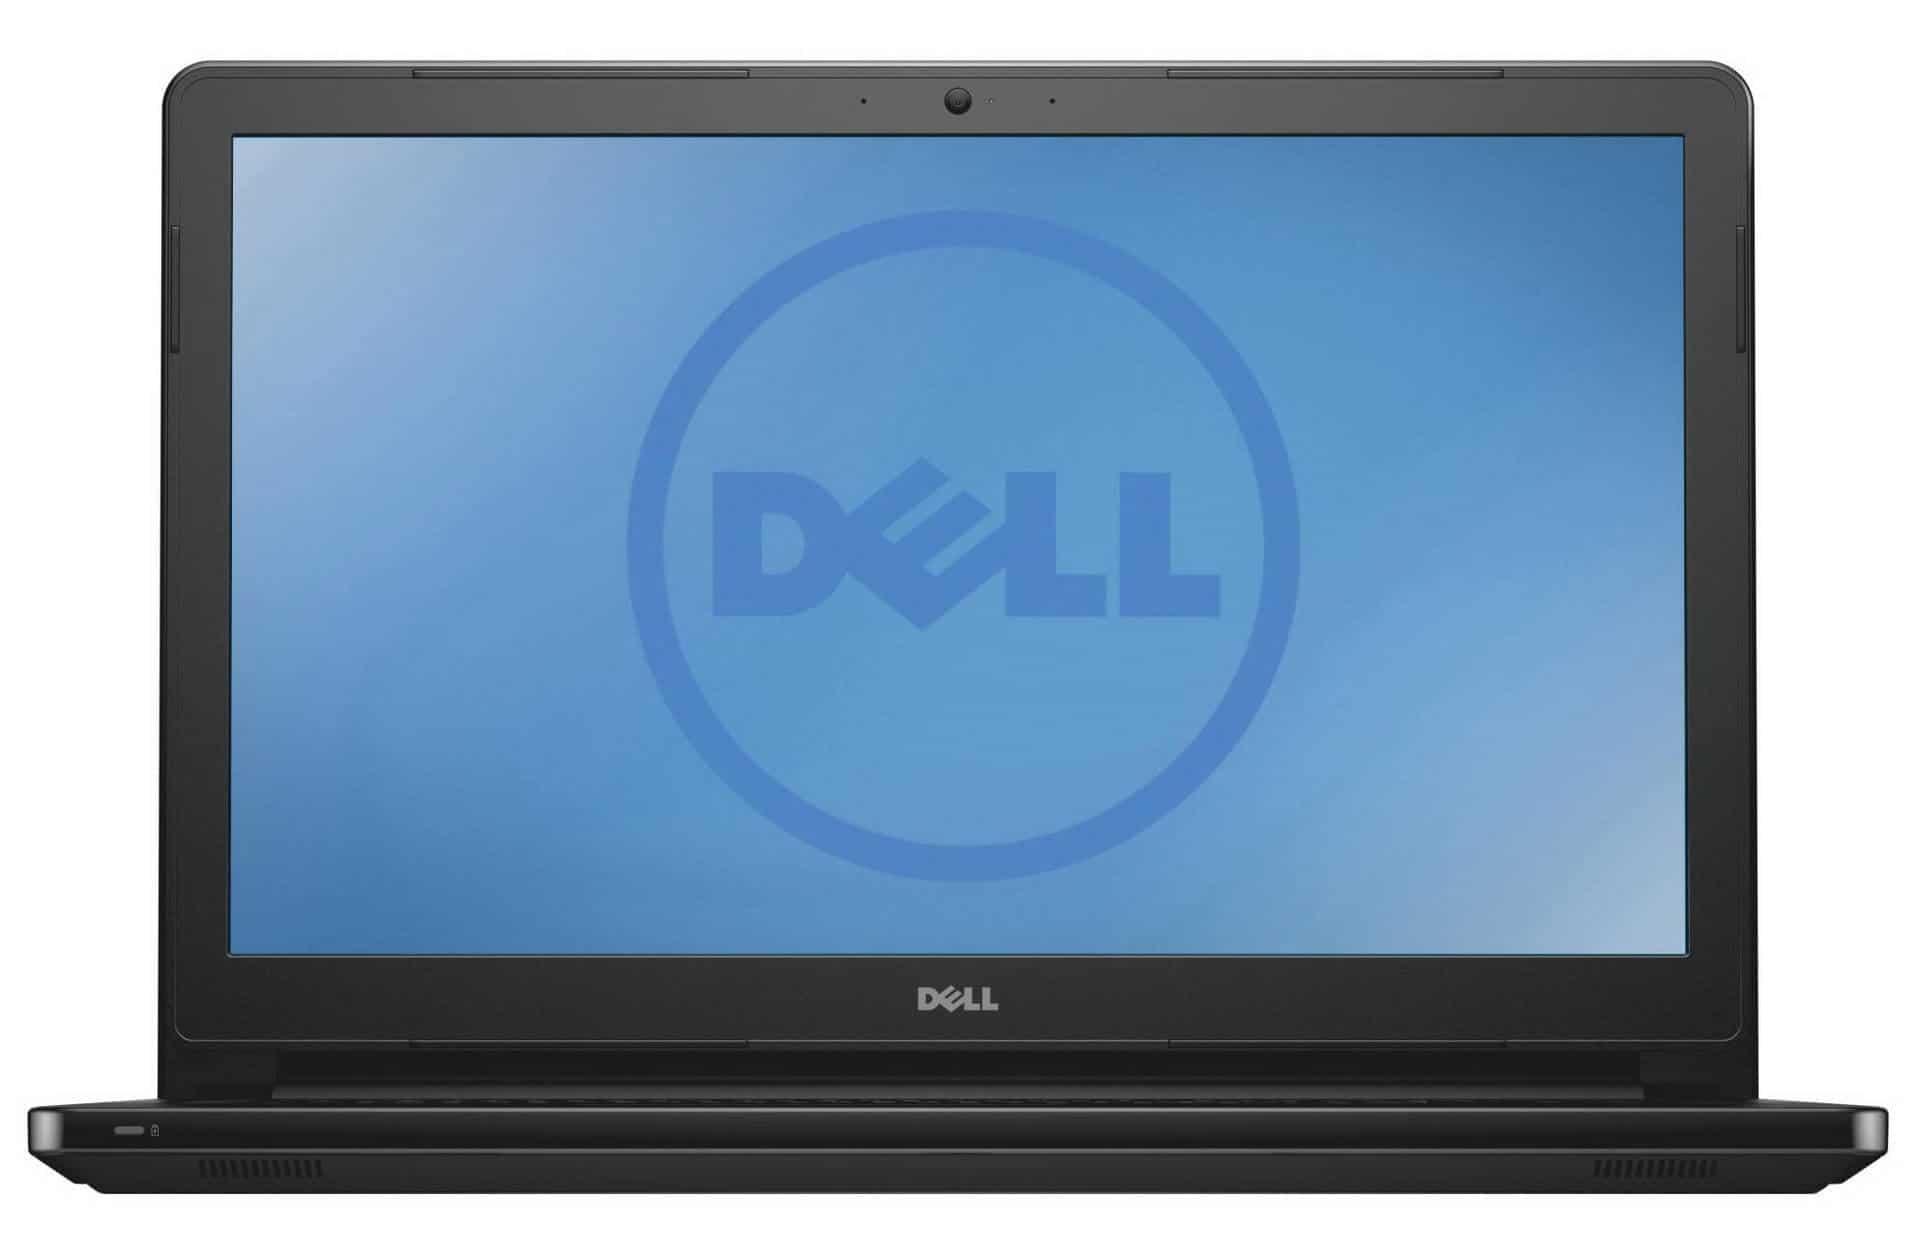 Dell Inspiron 5555 - laptop bun pentru indeplinirea sarcinilor zilnice!